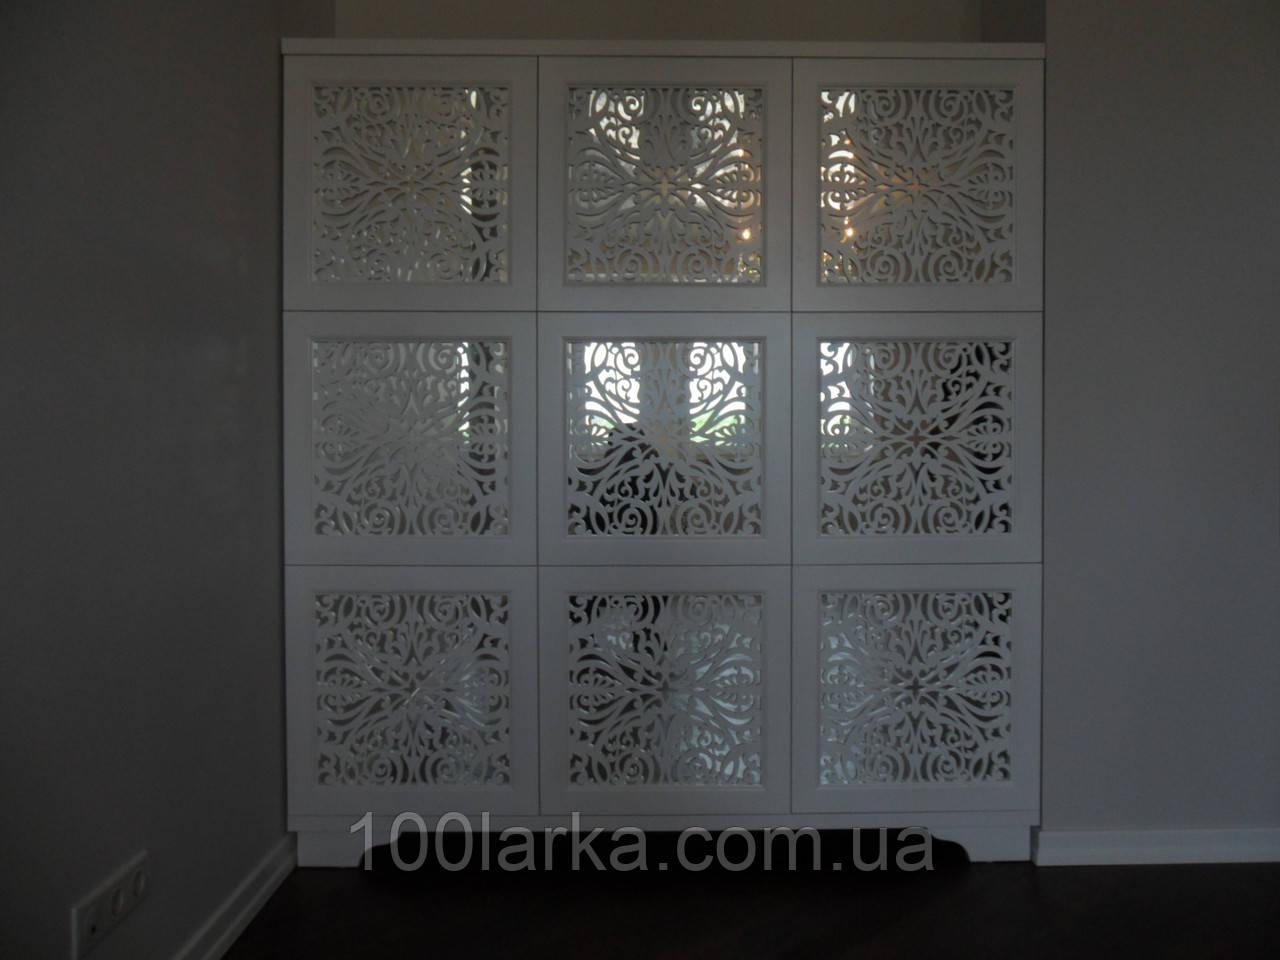 Шкаф деревянный, фасад зеркало с декоративной резьбой.